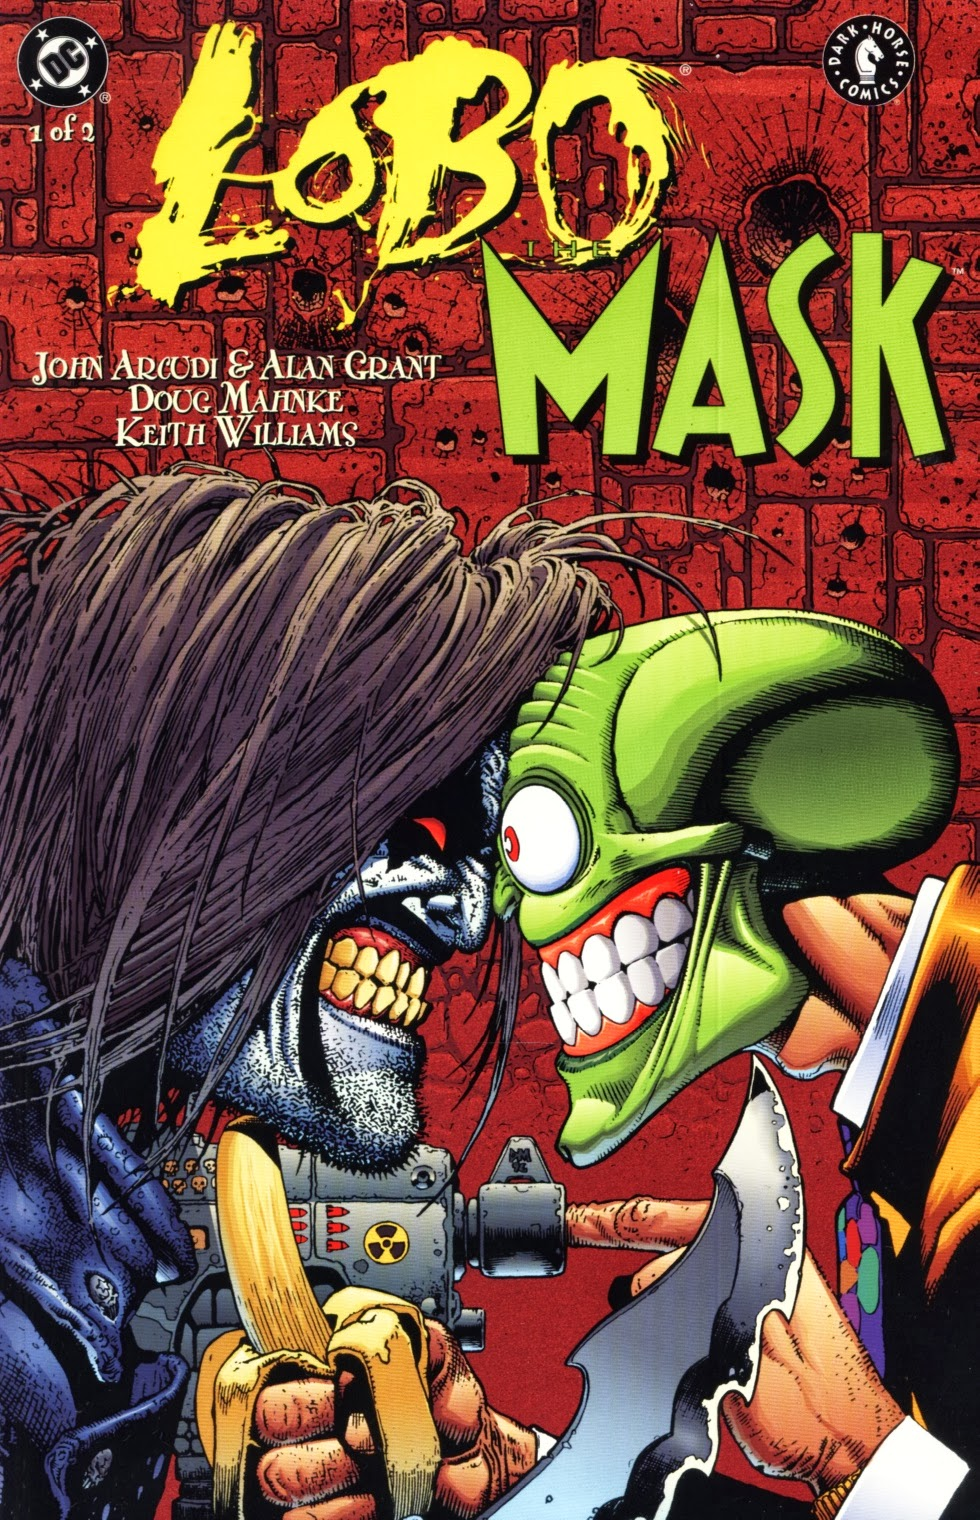 Leer The Mask / Joker  – The Mask / Lobo – The Mask /Grifter Online en Español